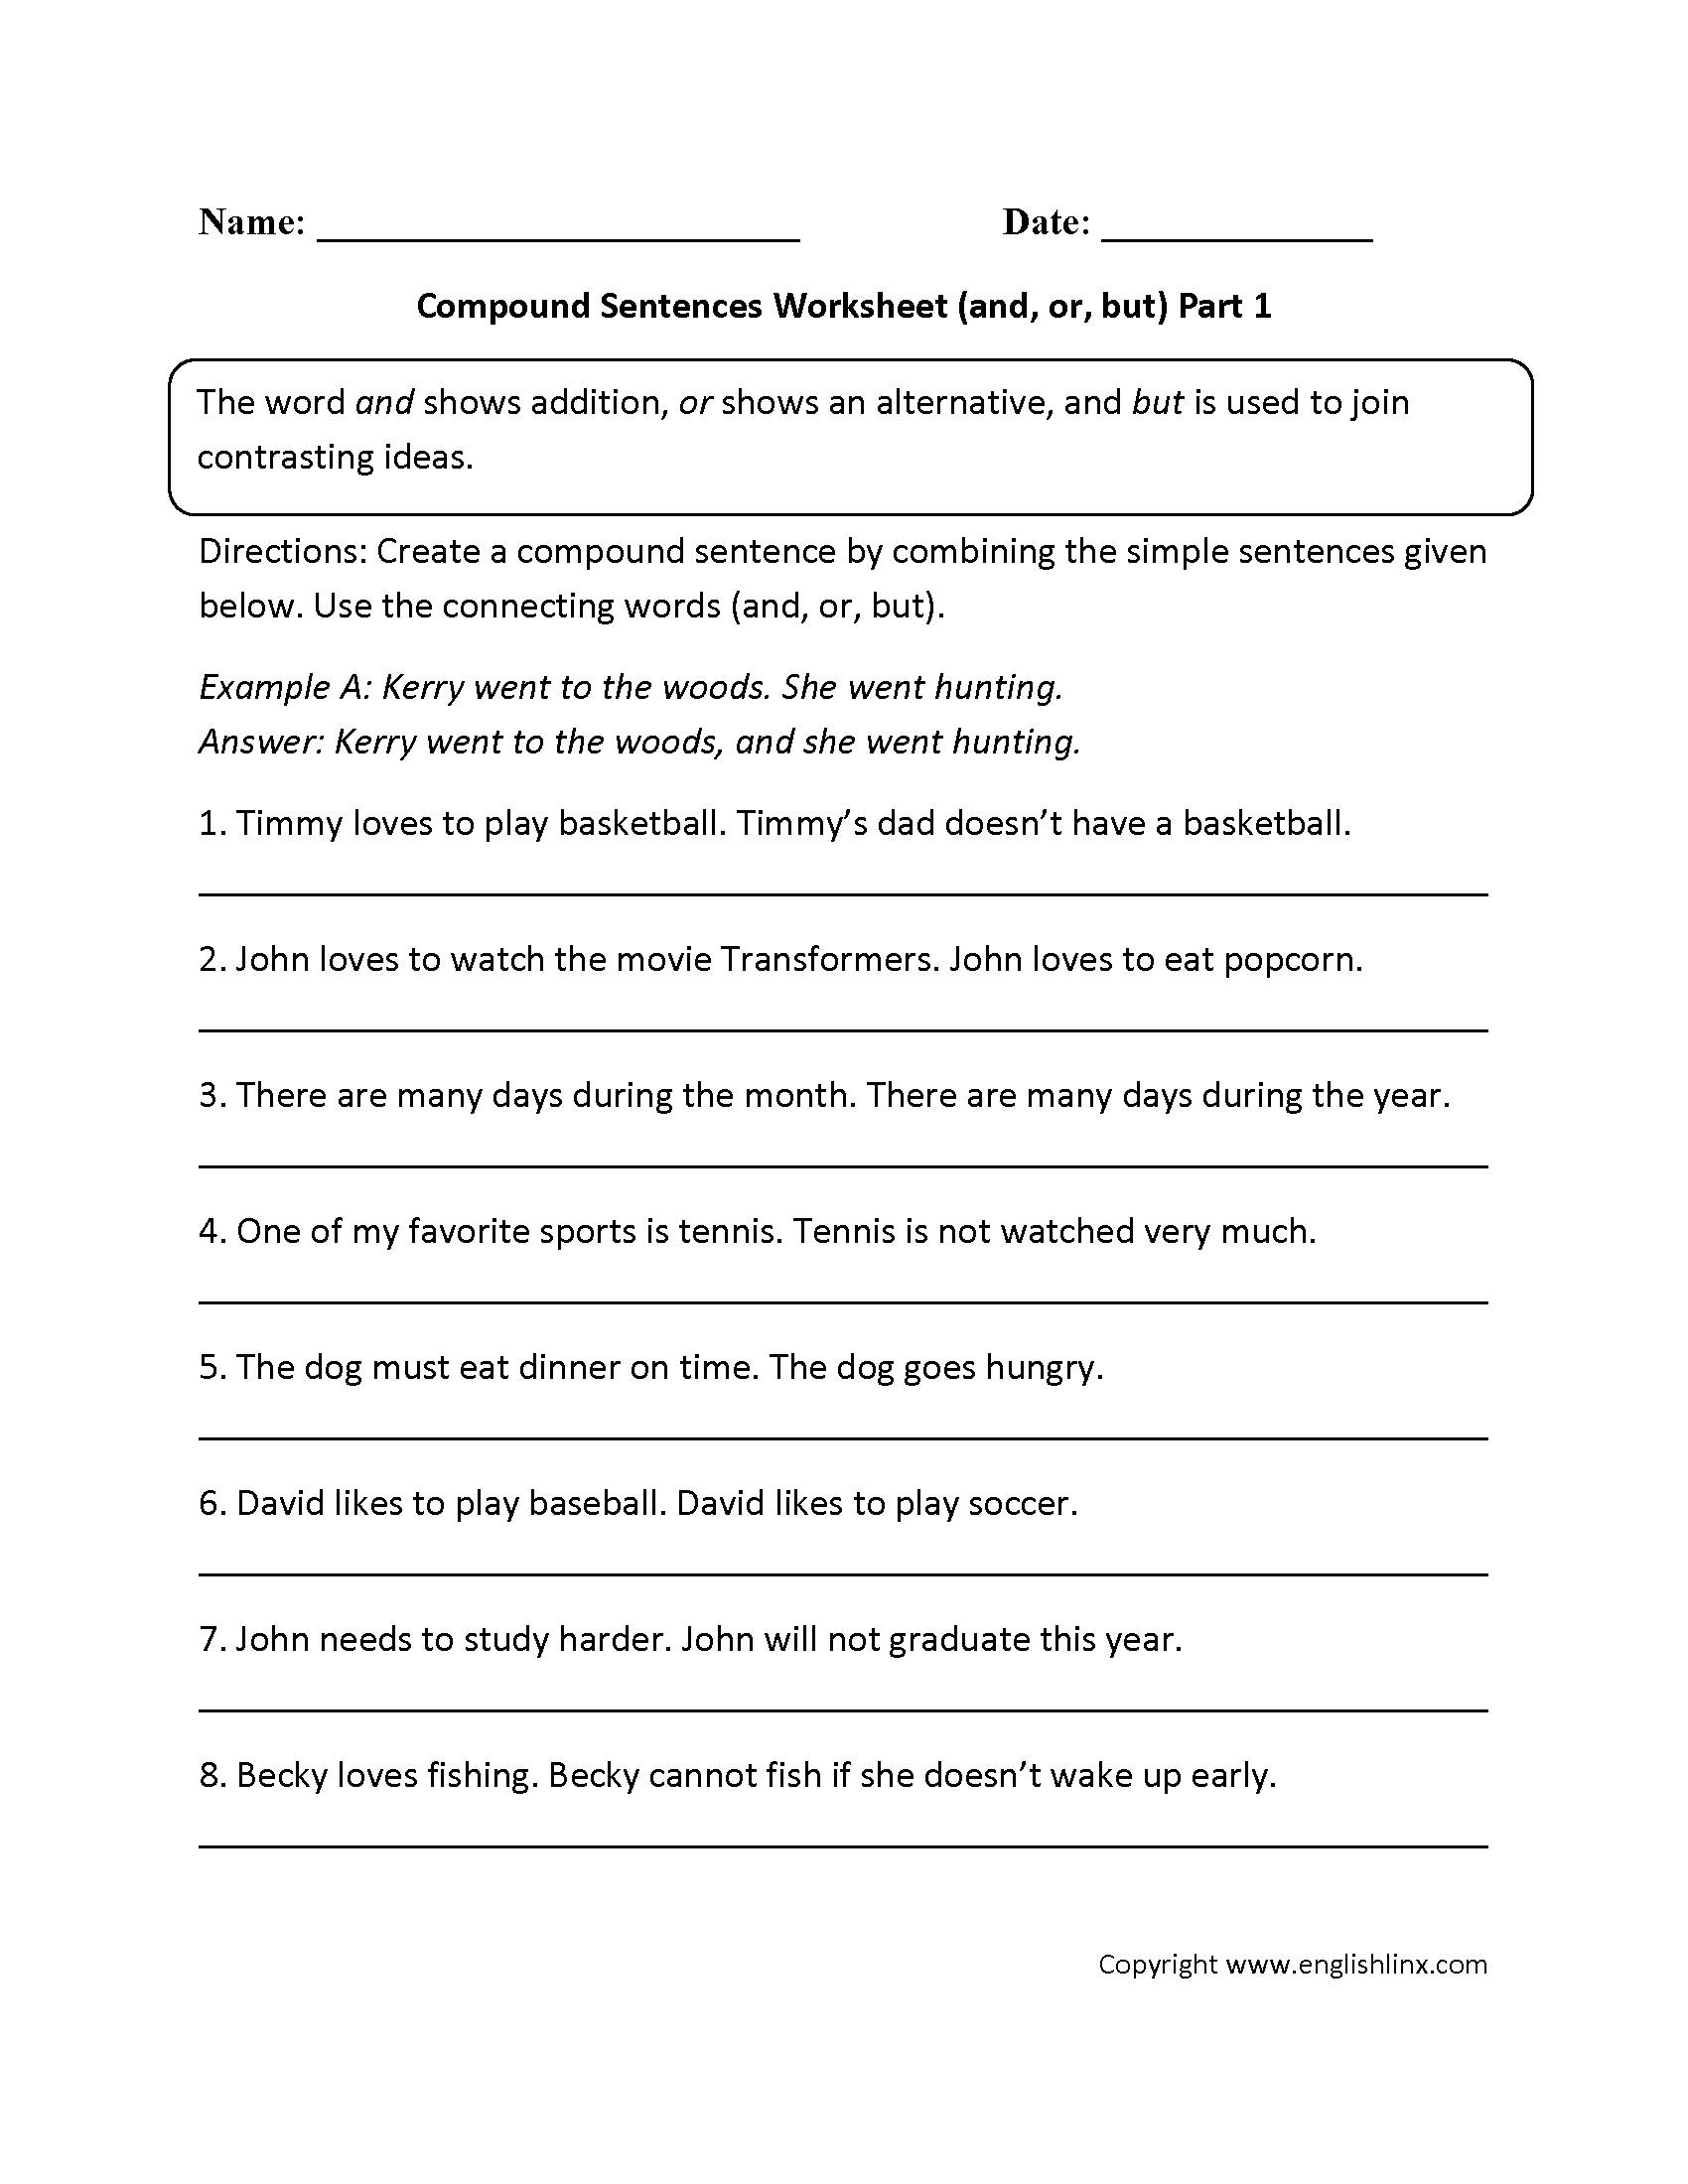 Complex Sentence Worksheets 3rd Grade Pound Sentences Worksheet 3rd Grade